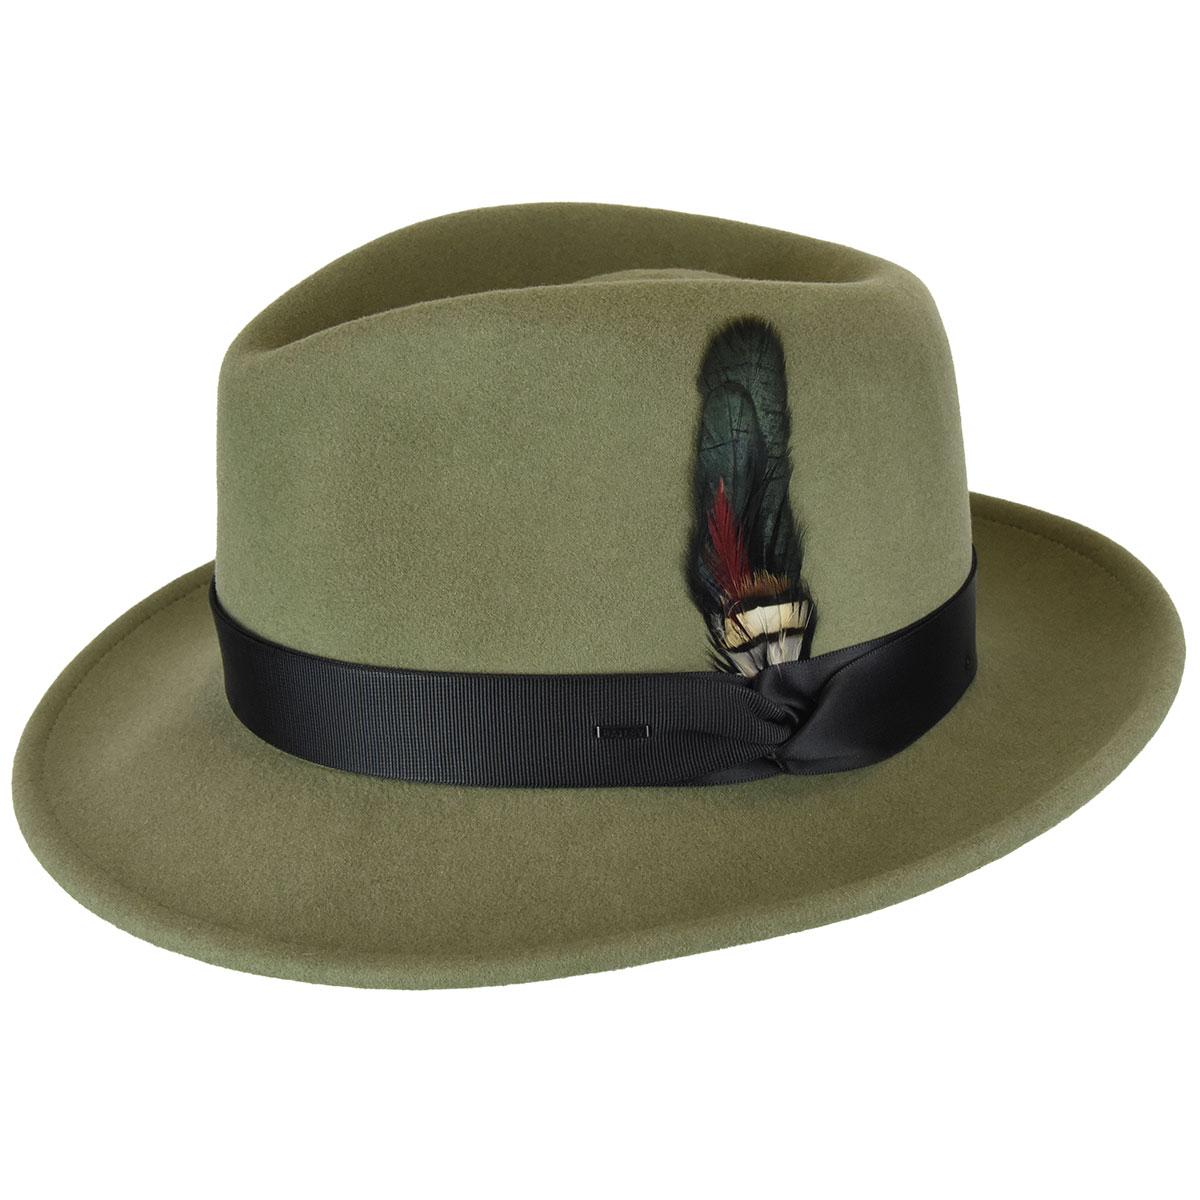 1940s Mens Hat Styles and History Metrick Fedora $120.00 AT vintagedancer.com